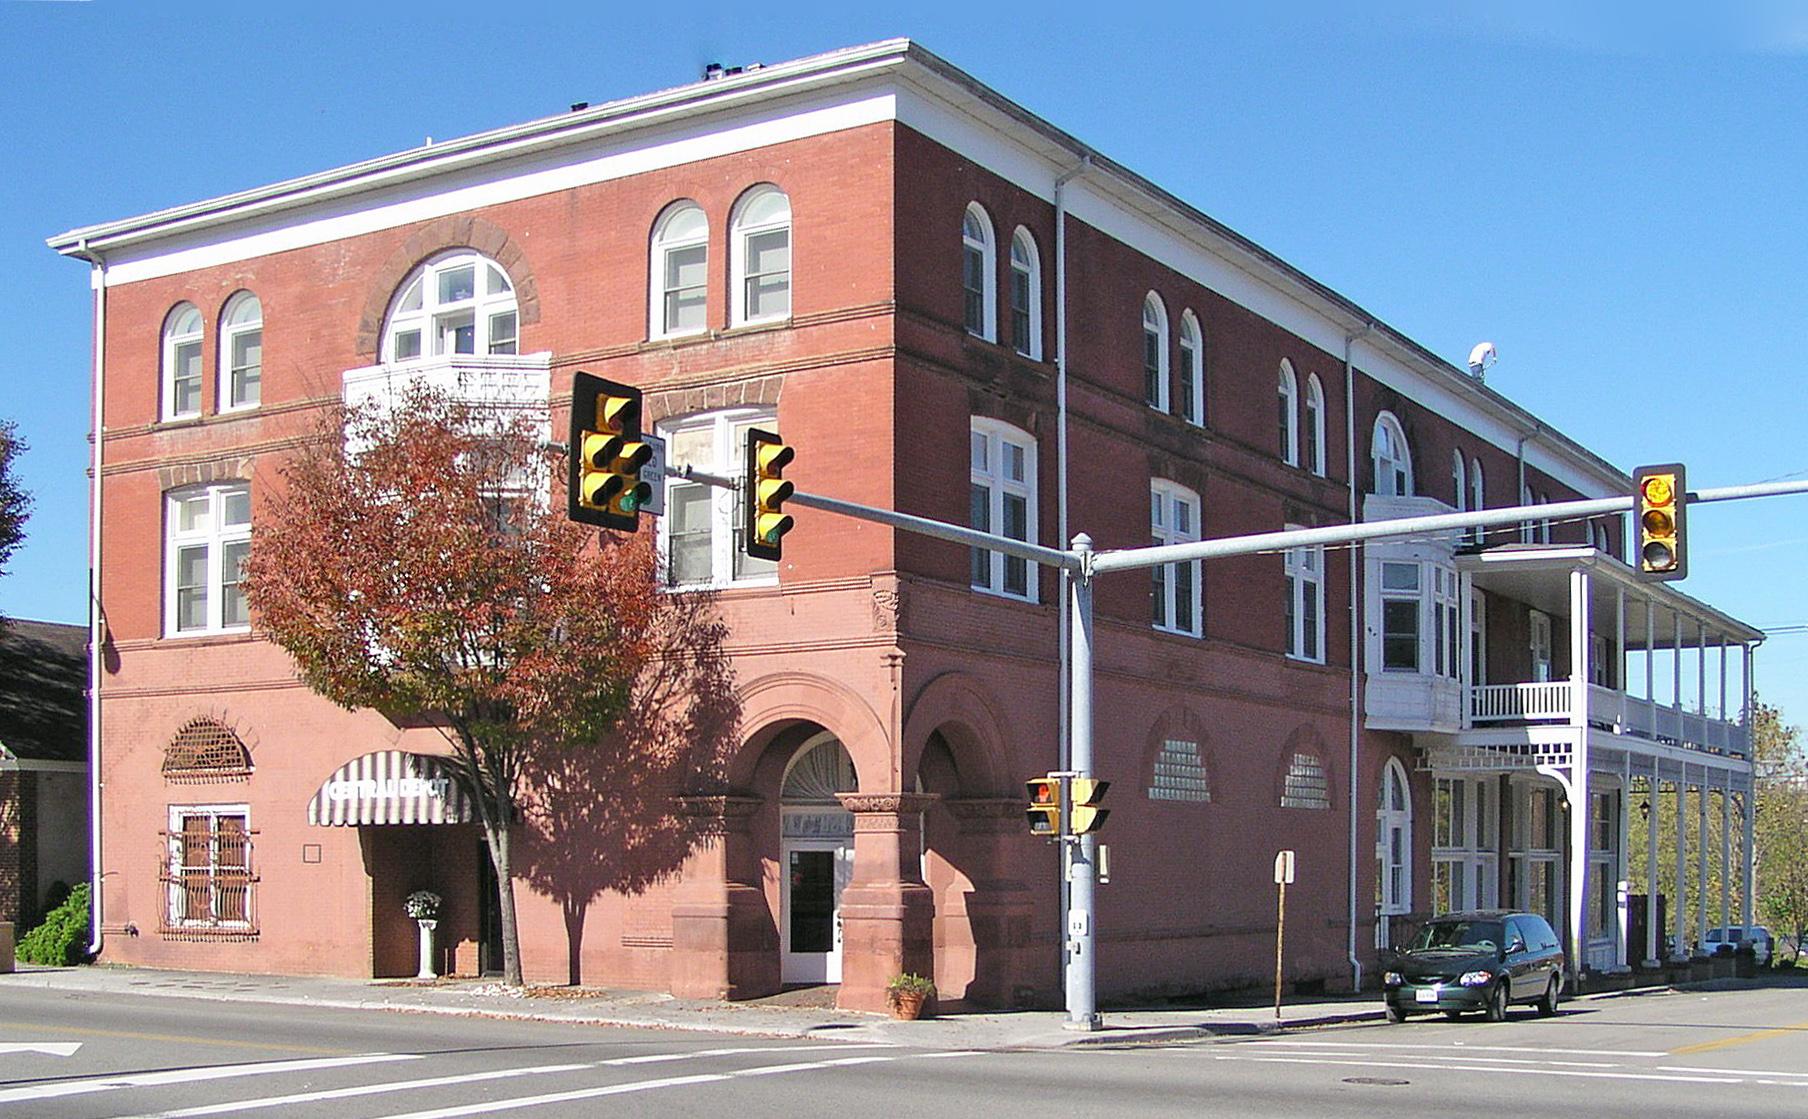 West Radford Commercial Historic District